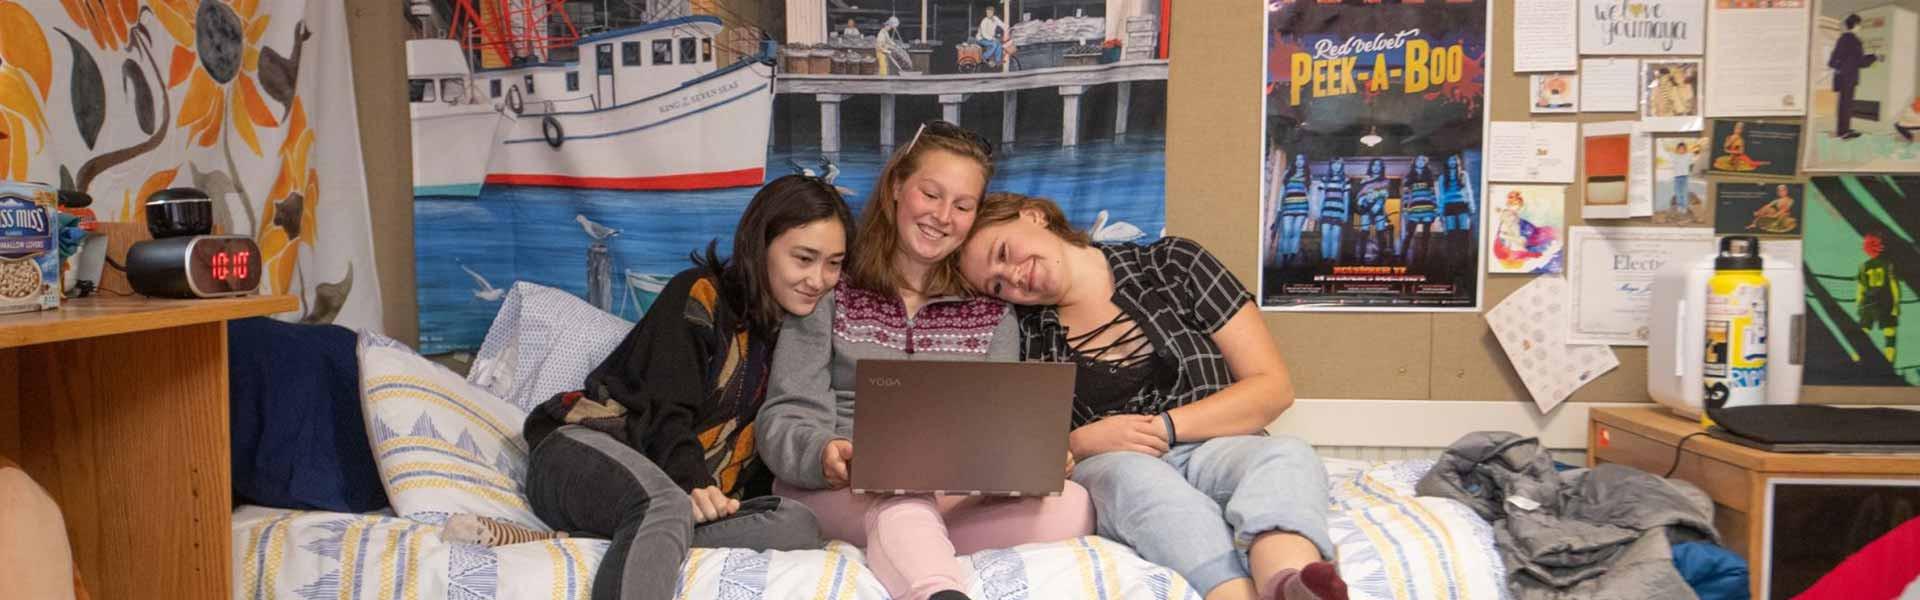 Girls smiling Vermont Academy